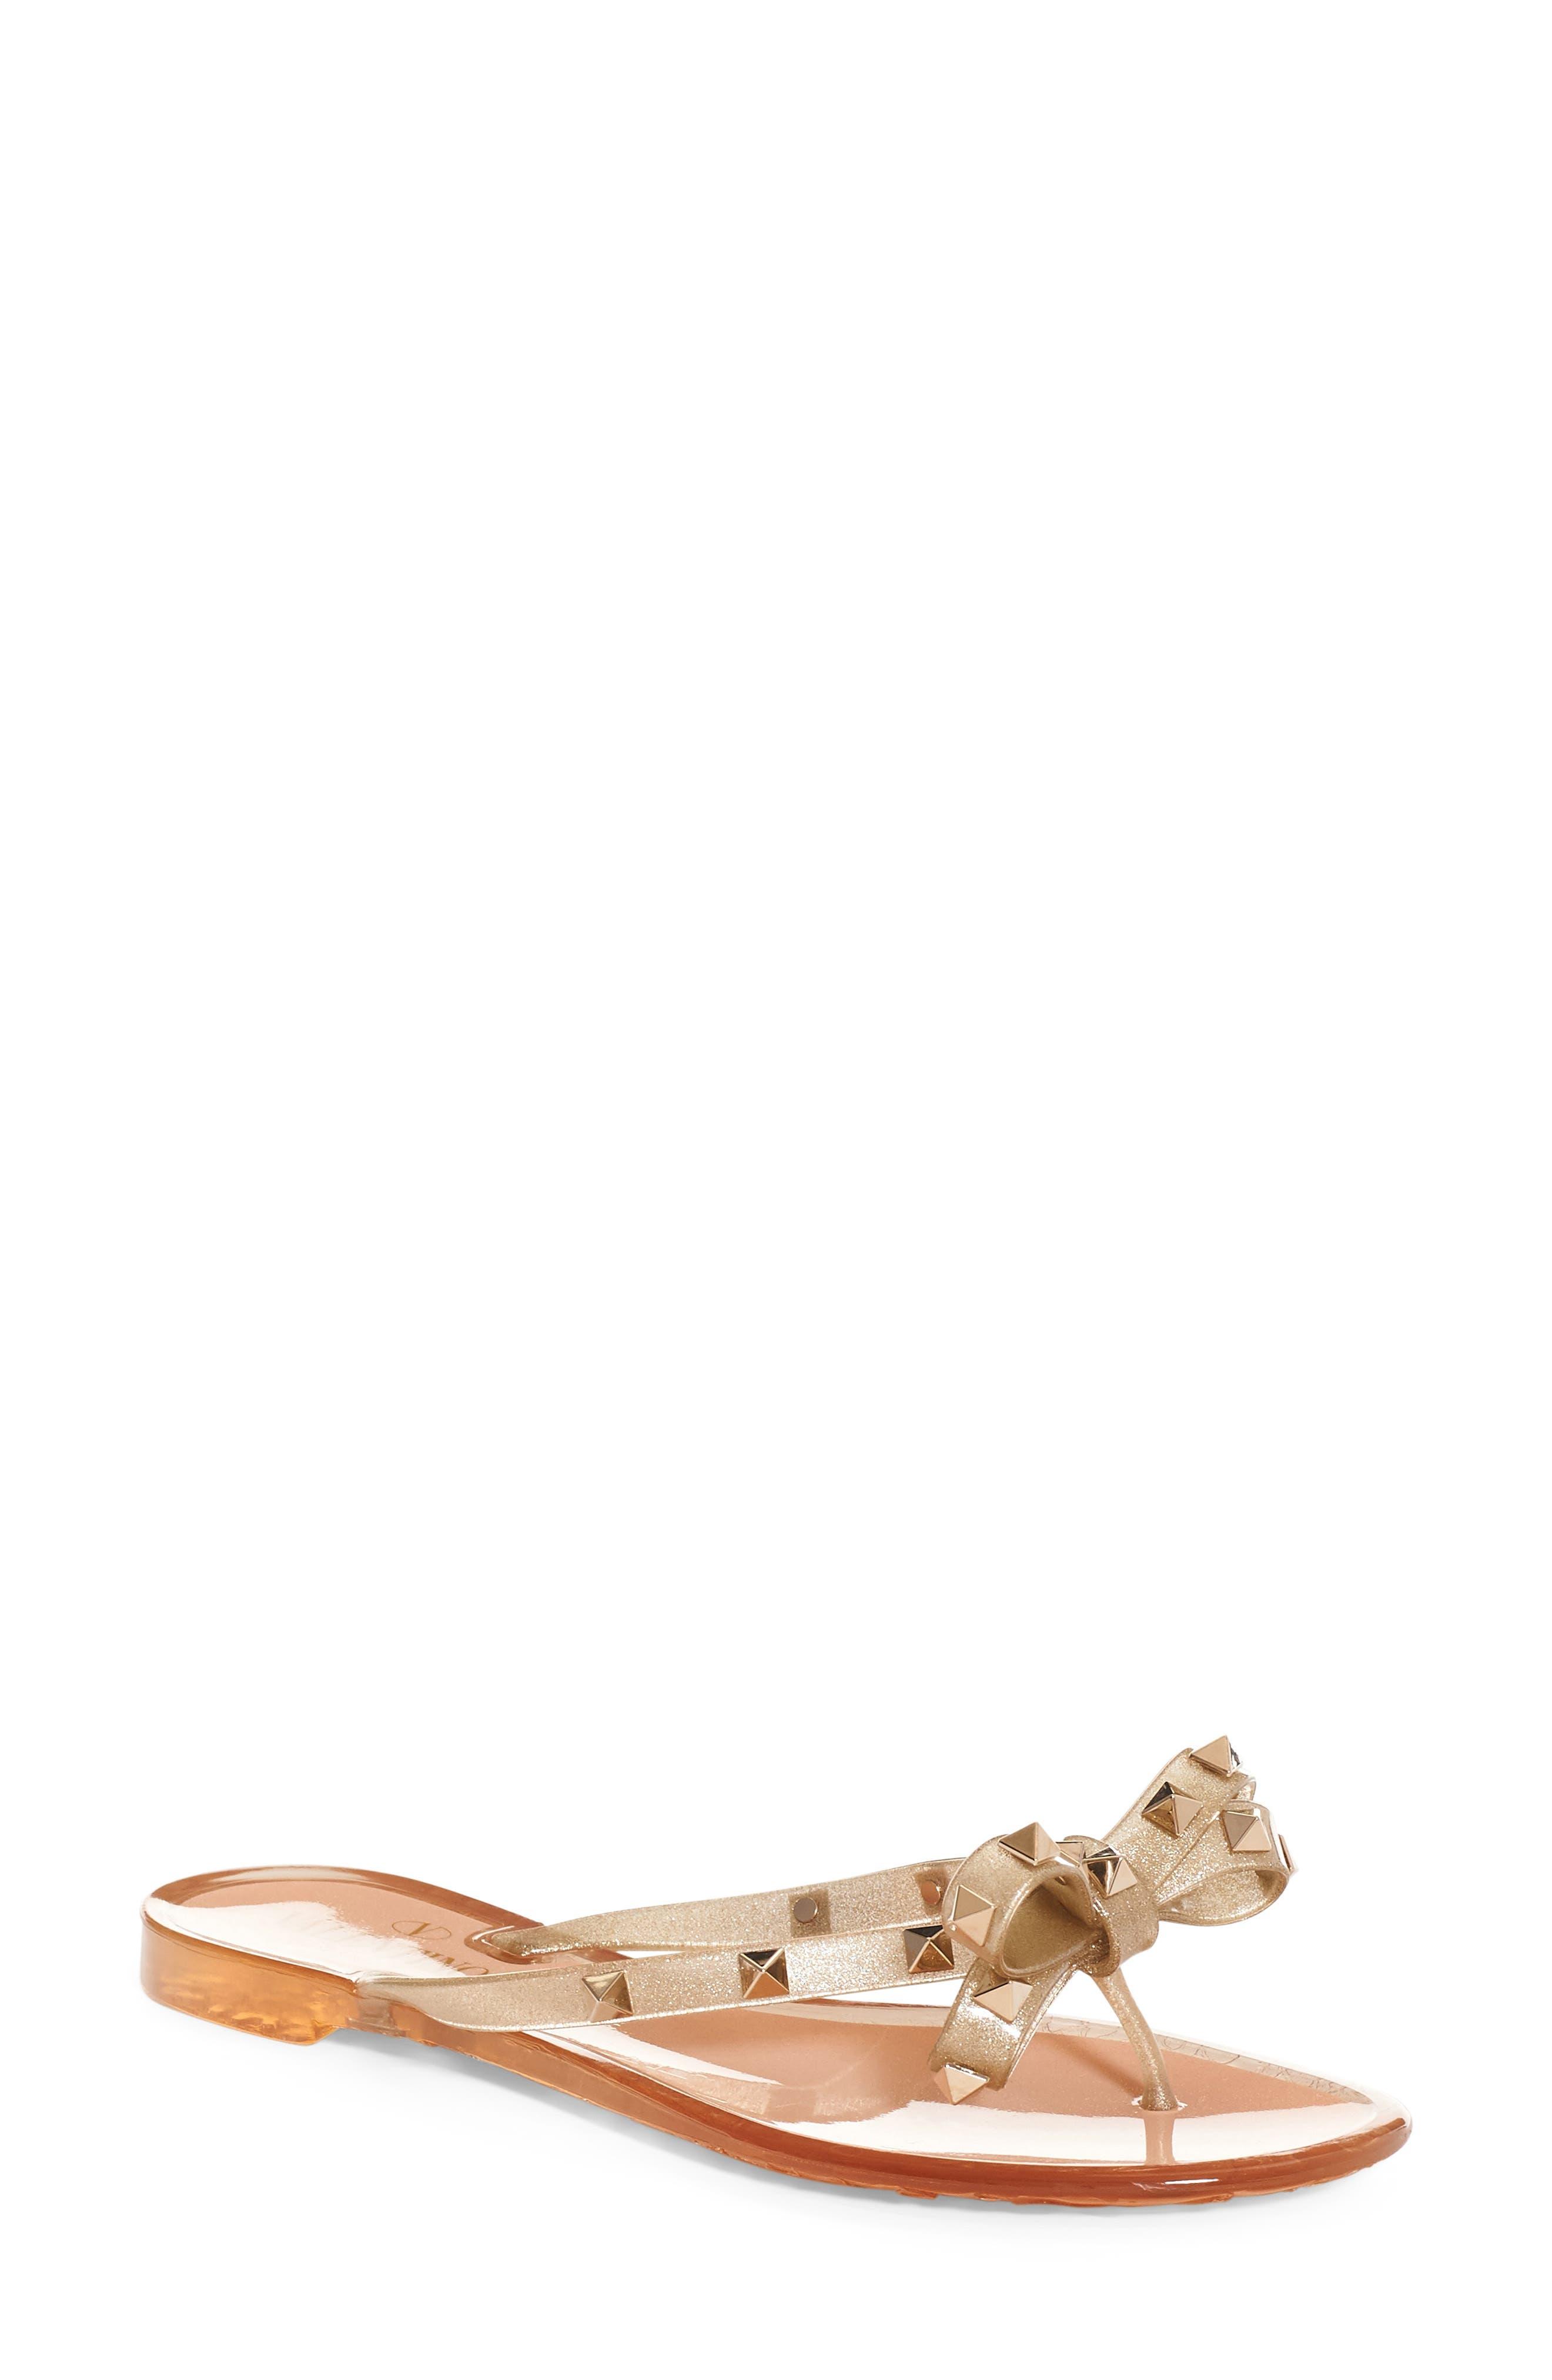 Main Image - Valentino 'Rockstud' Flip Flop (Women)